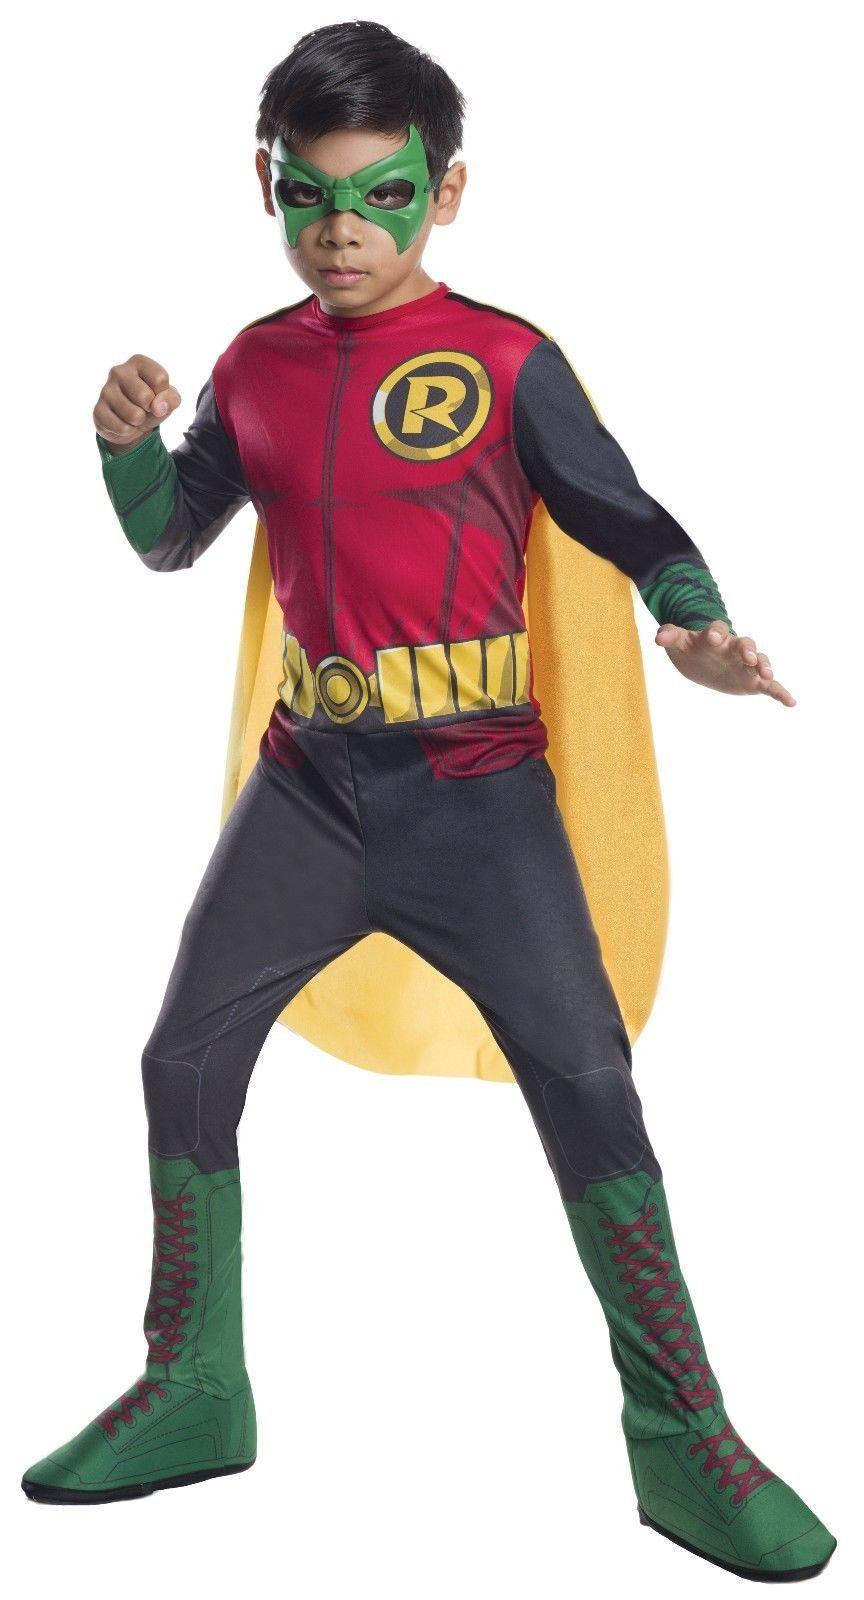 Rubini Robin Dc Comics Batman Gotham Bambino Ragazzi Costume Halloween 610828